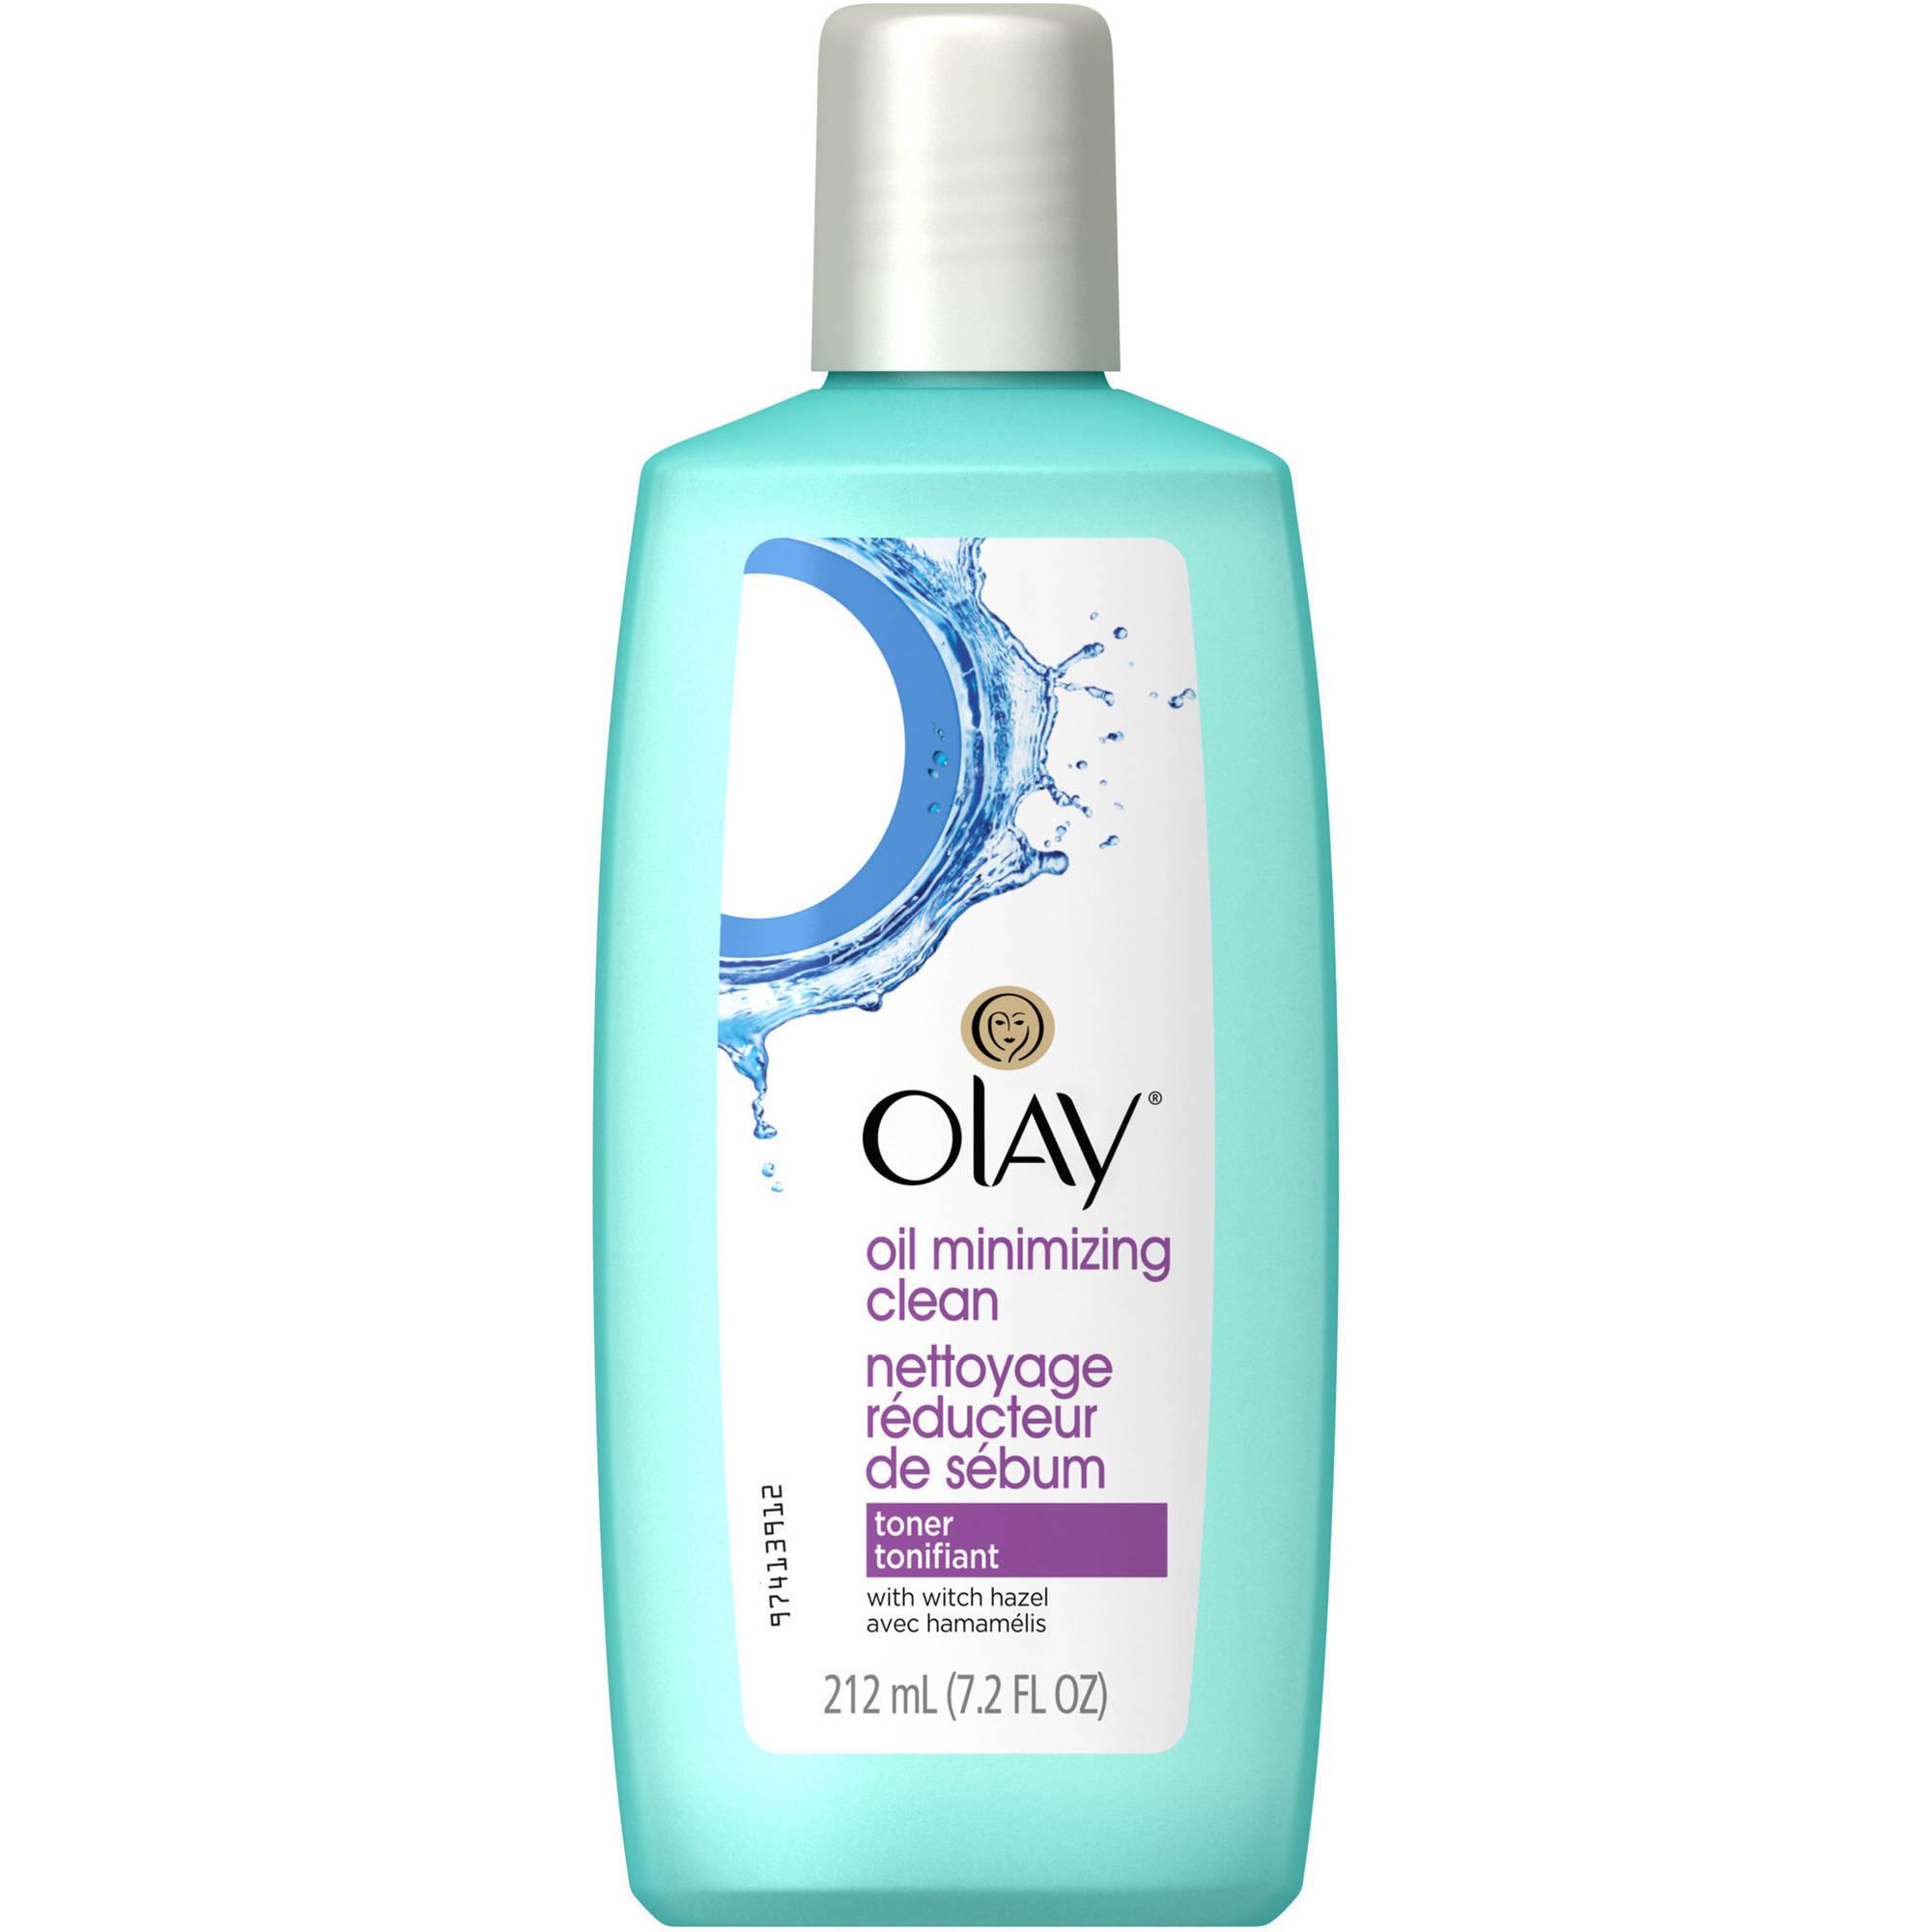 Olay Oil Minimizing Clean Toner, 7.2 fl oz